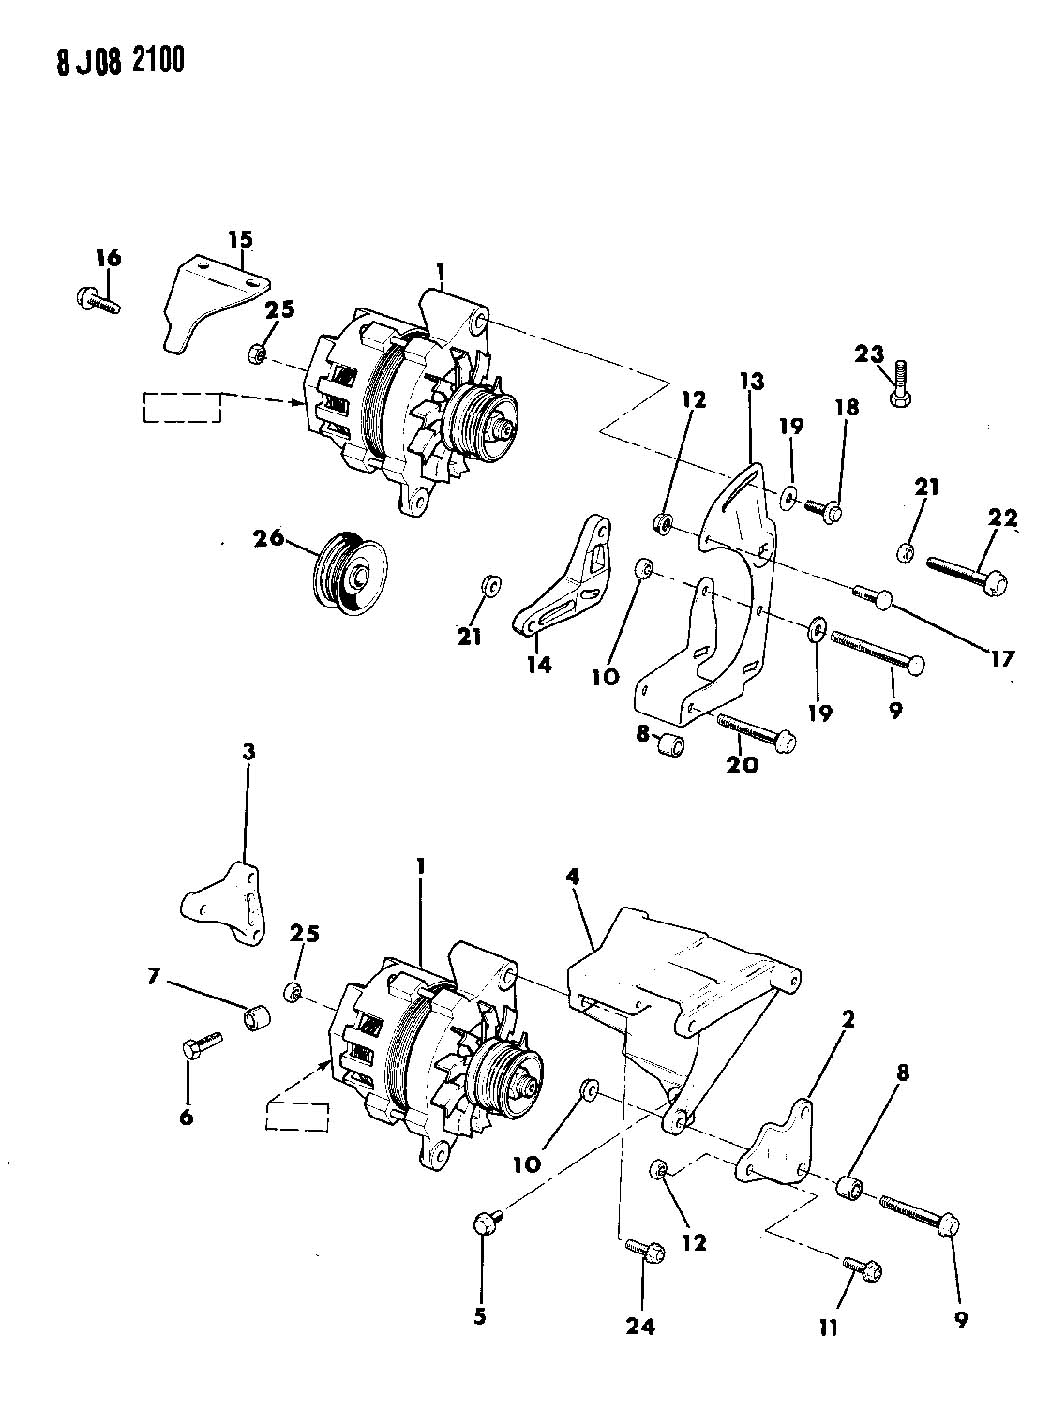 Jeep Cherokee 2 5l I4 5 Speed Manual Alternator And